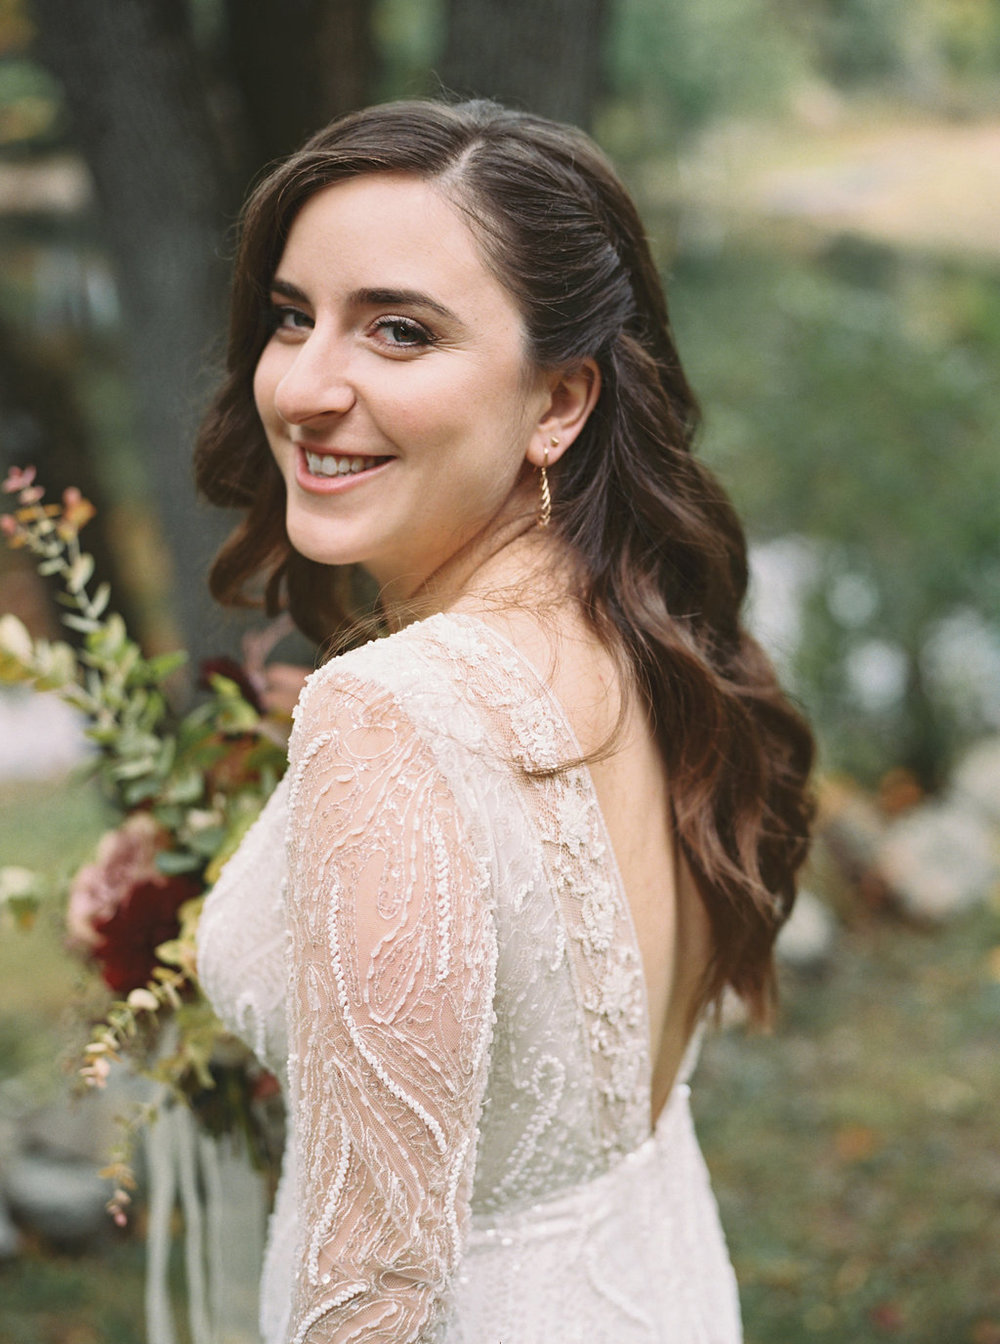 Photo by:  Lauren Balingit Photography   Hair & Makeup: Ashley Lugashi